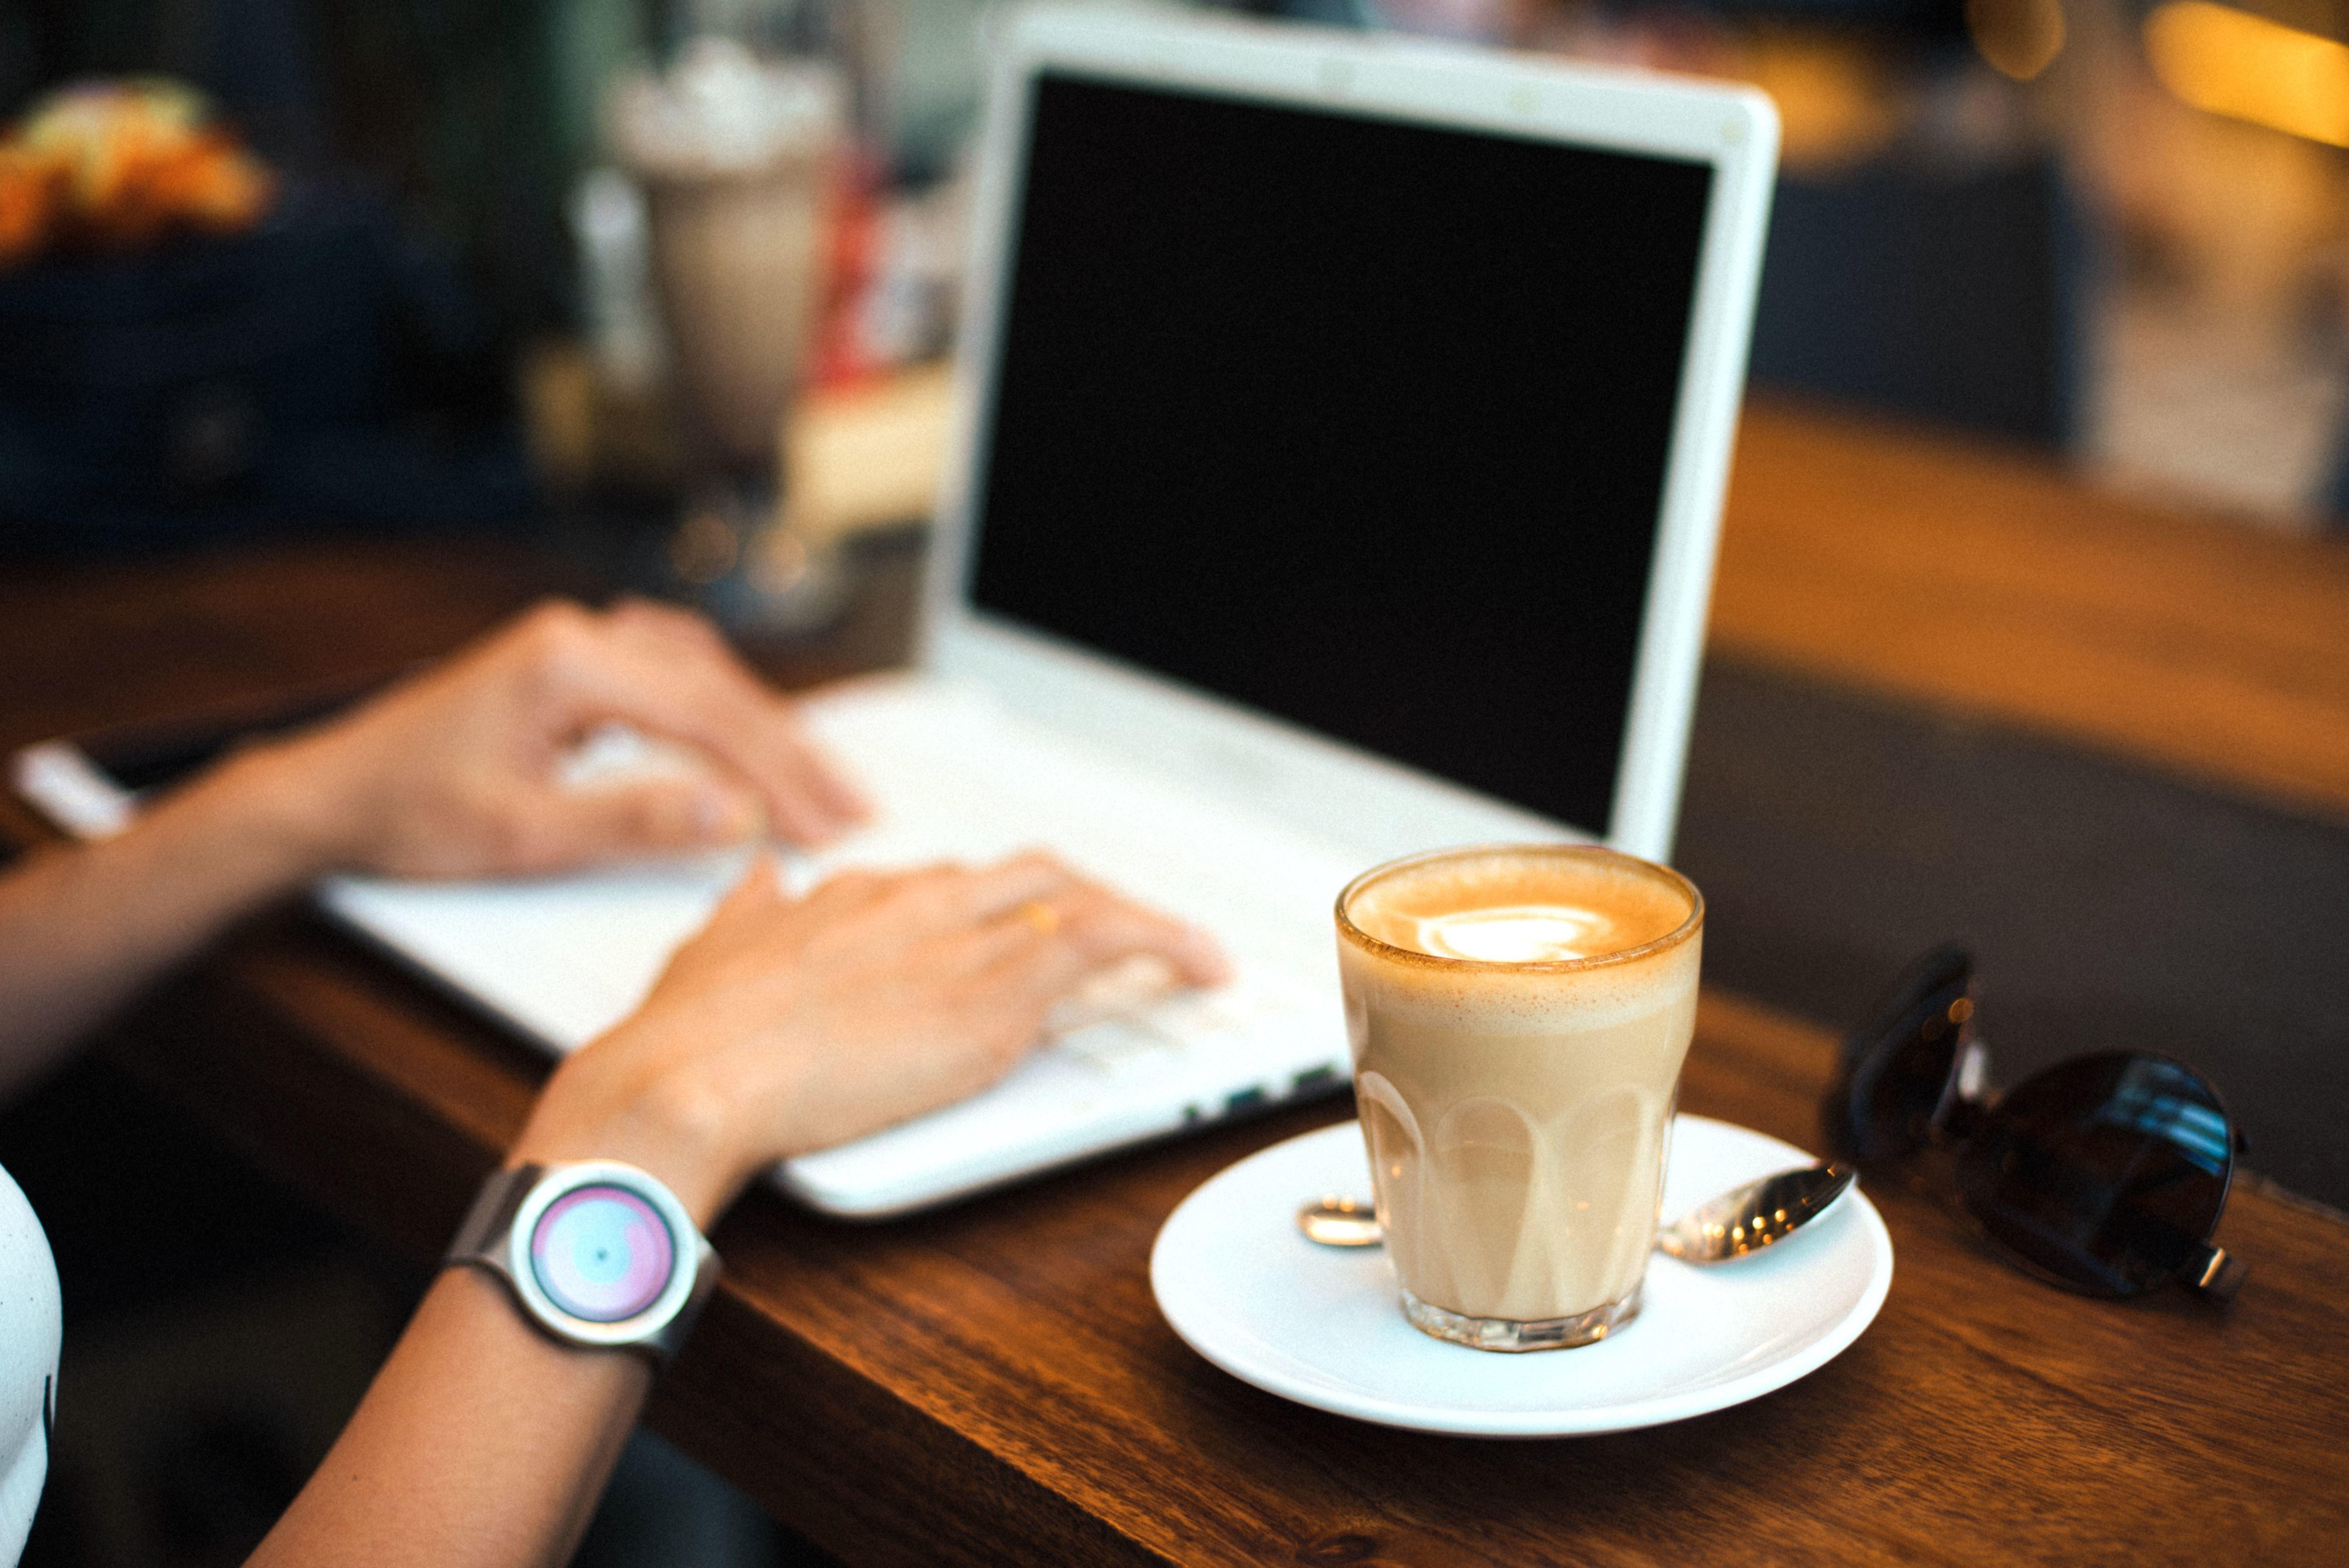 Free Picture Keyboard Computer Coffee Desk Drink Laptop